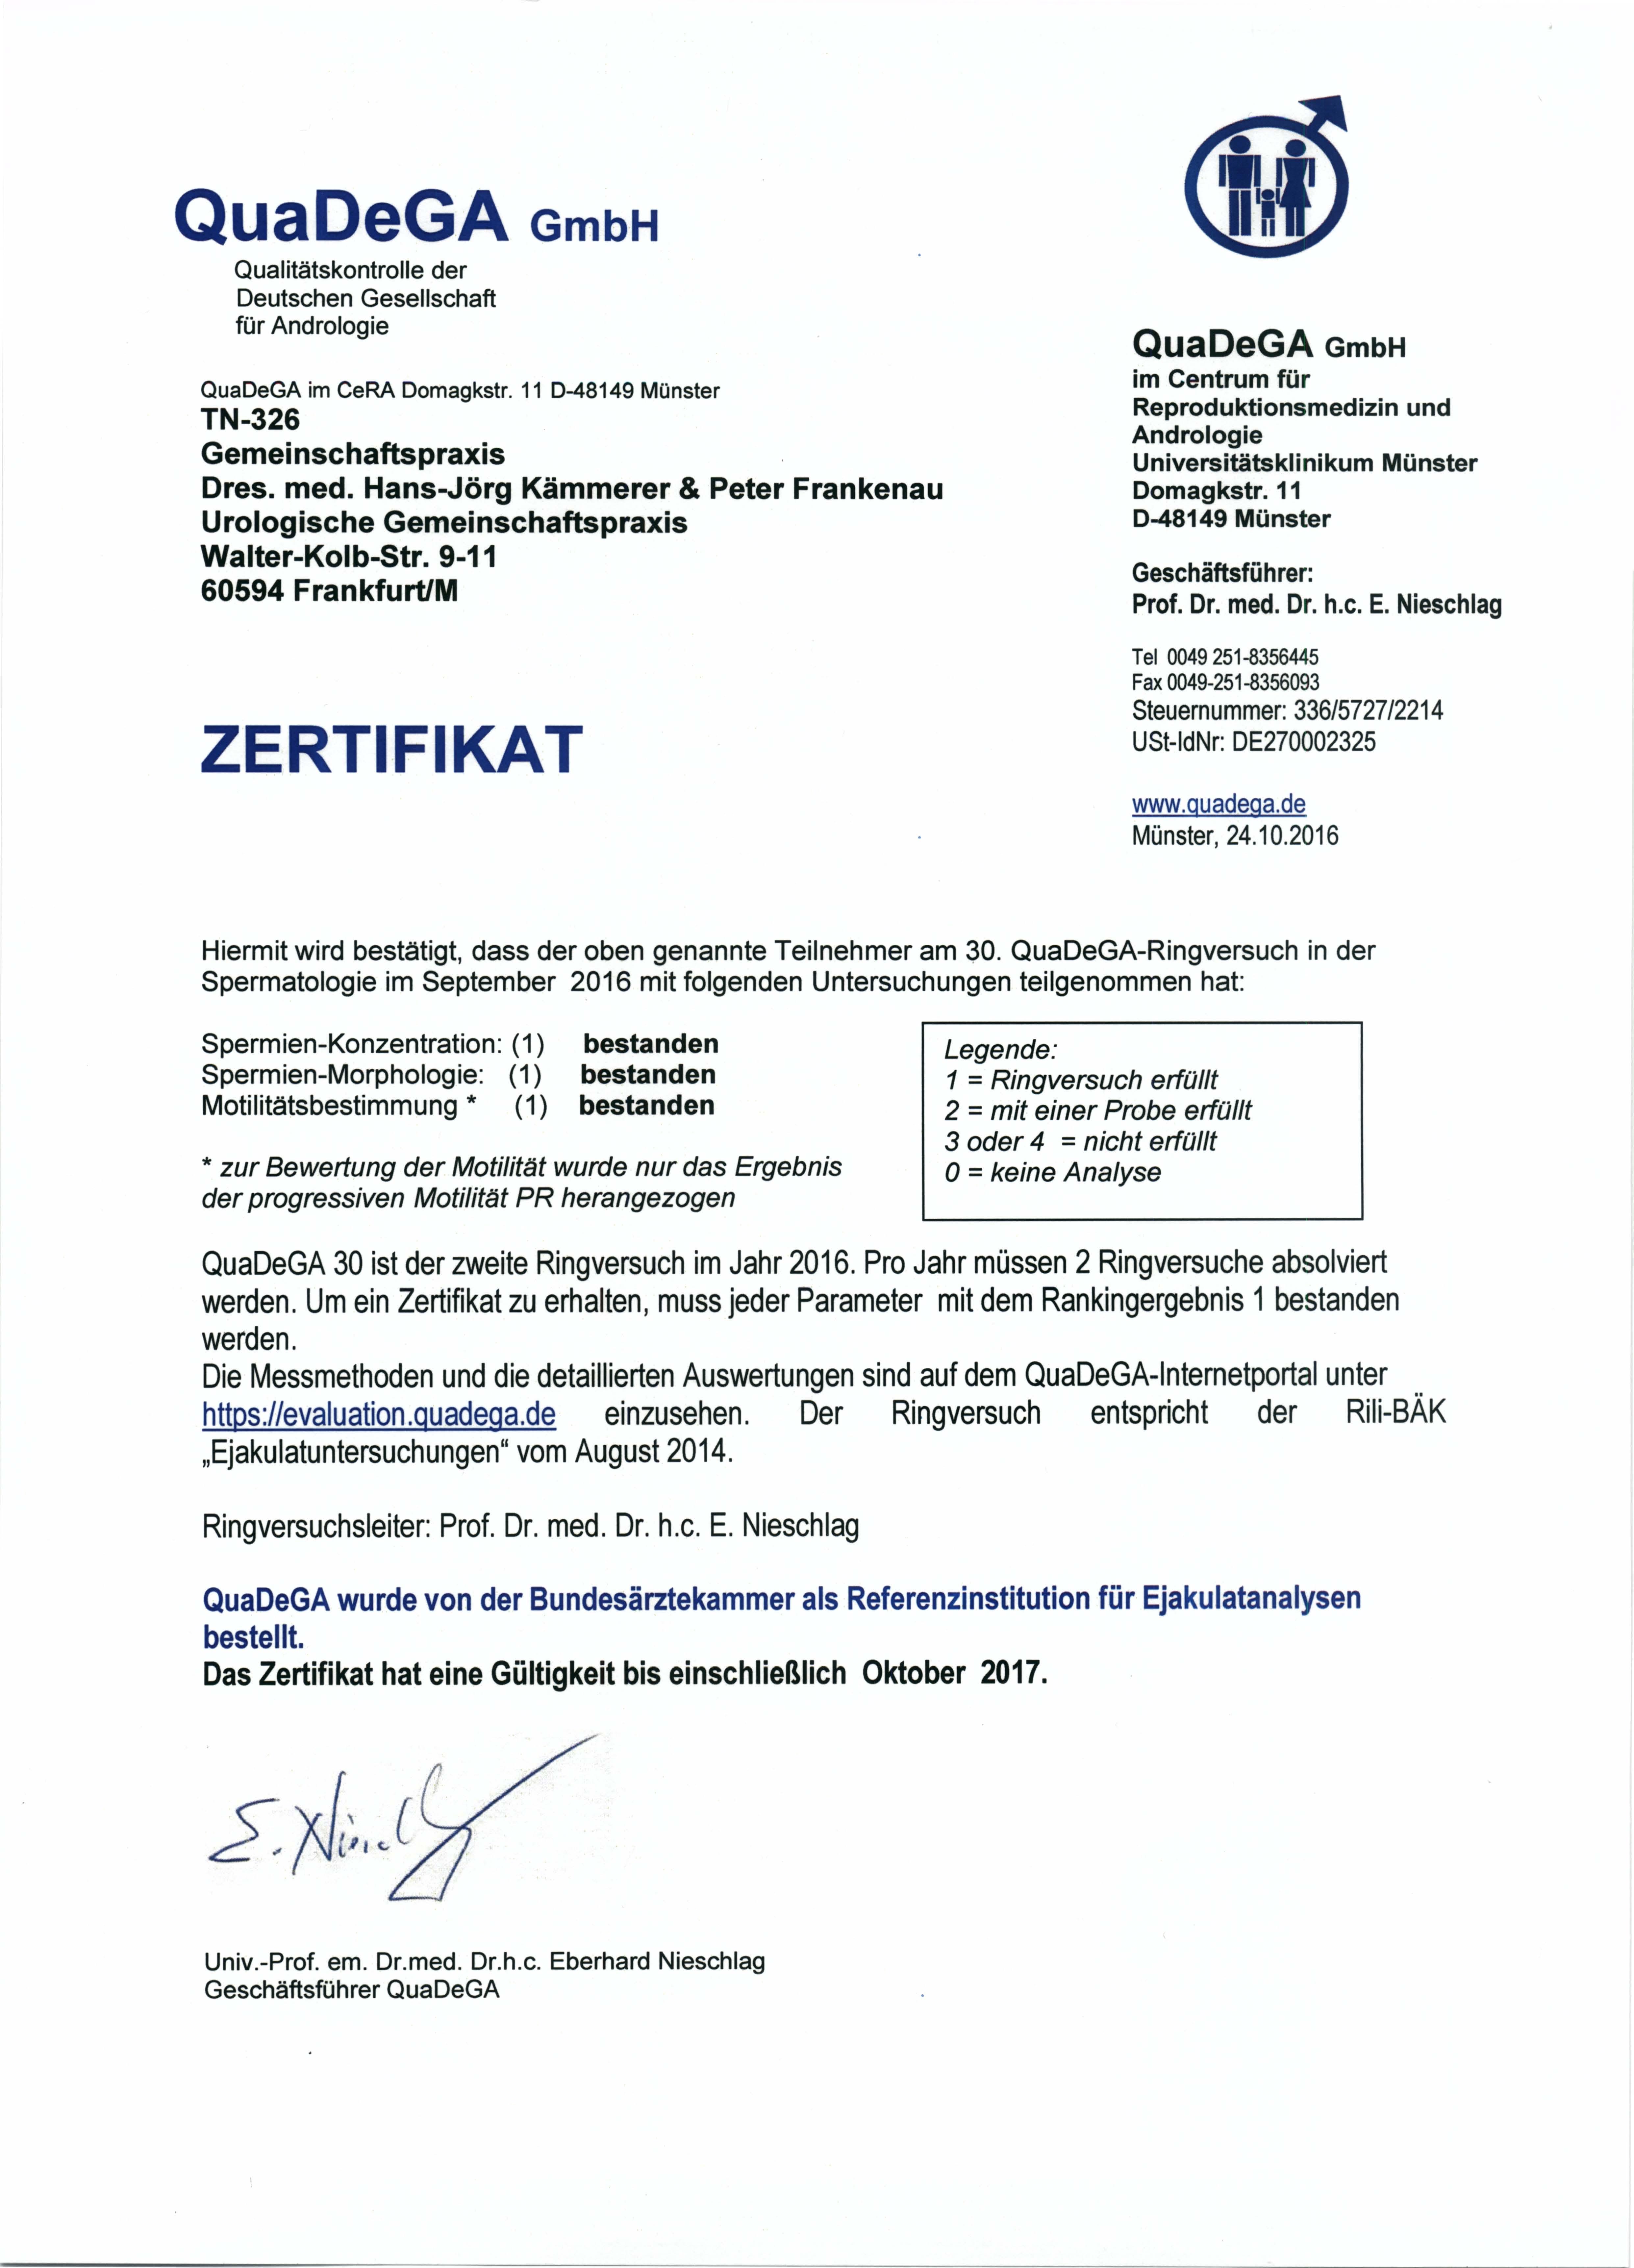 Zertifikate |